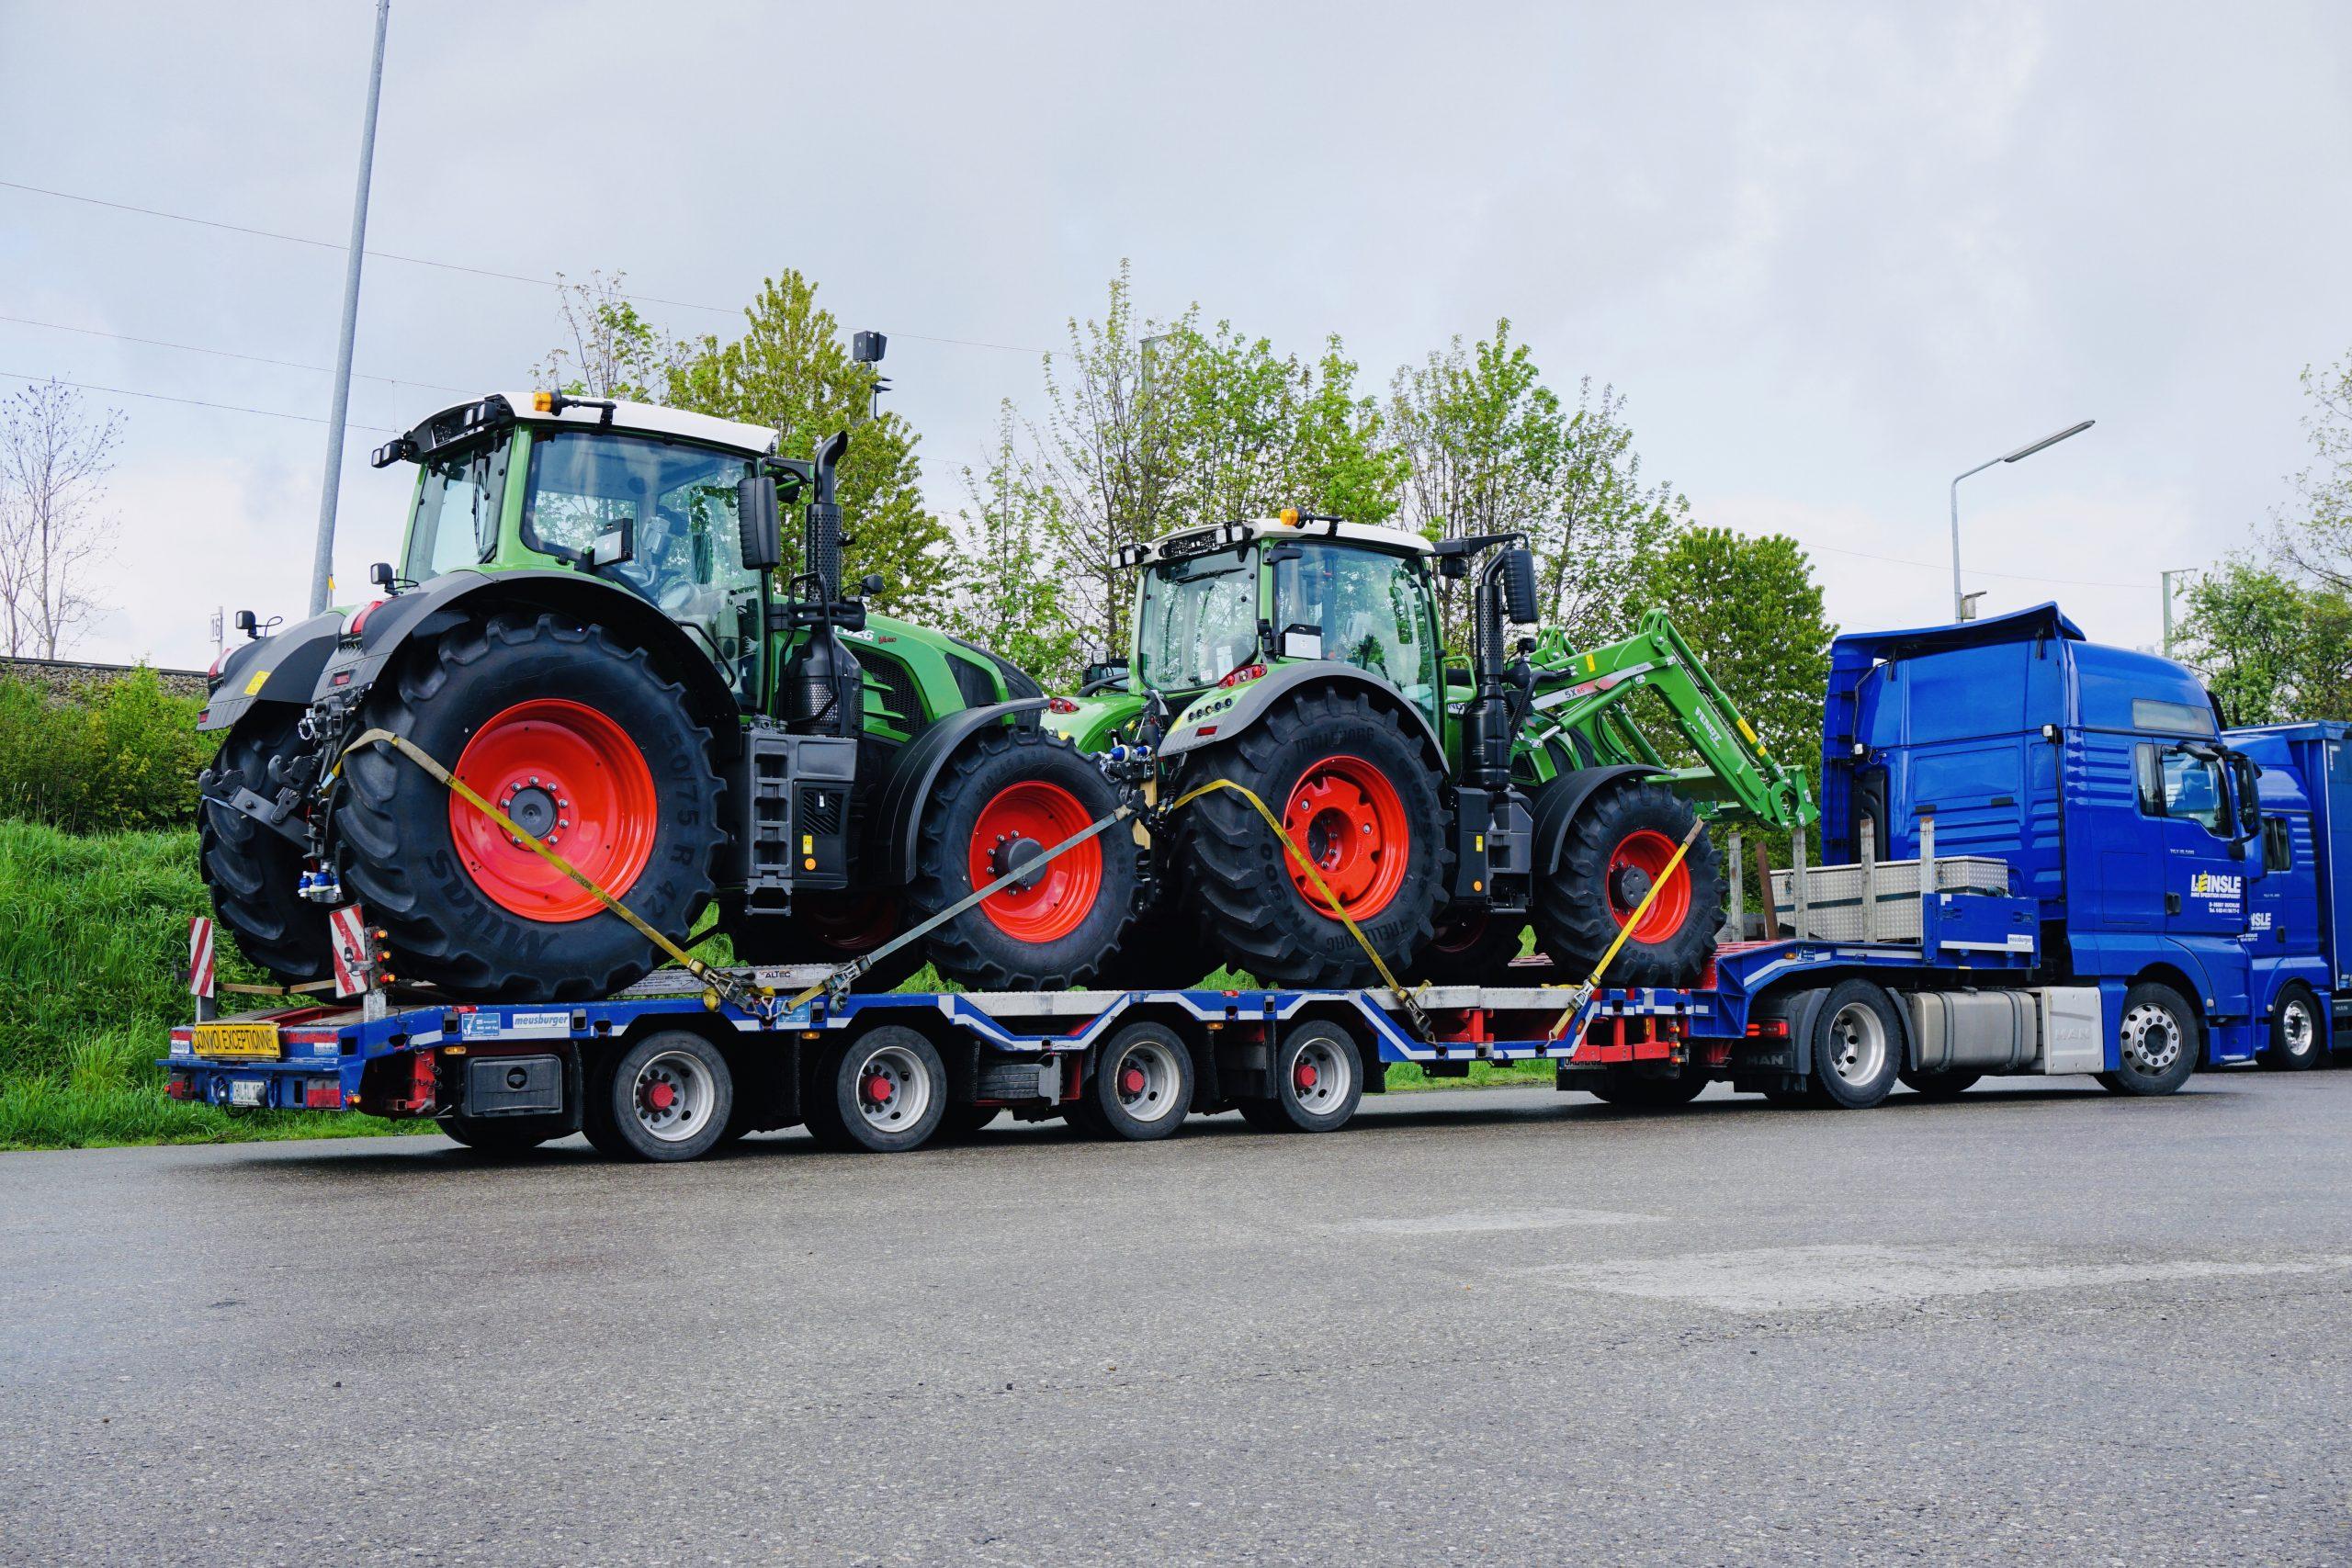 https://www.leinsle.com/wp-content/uploads/Semiteiflader-Traktor-e1578930440912.jpeg